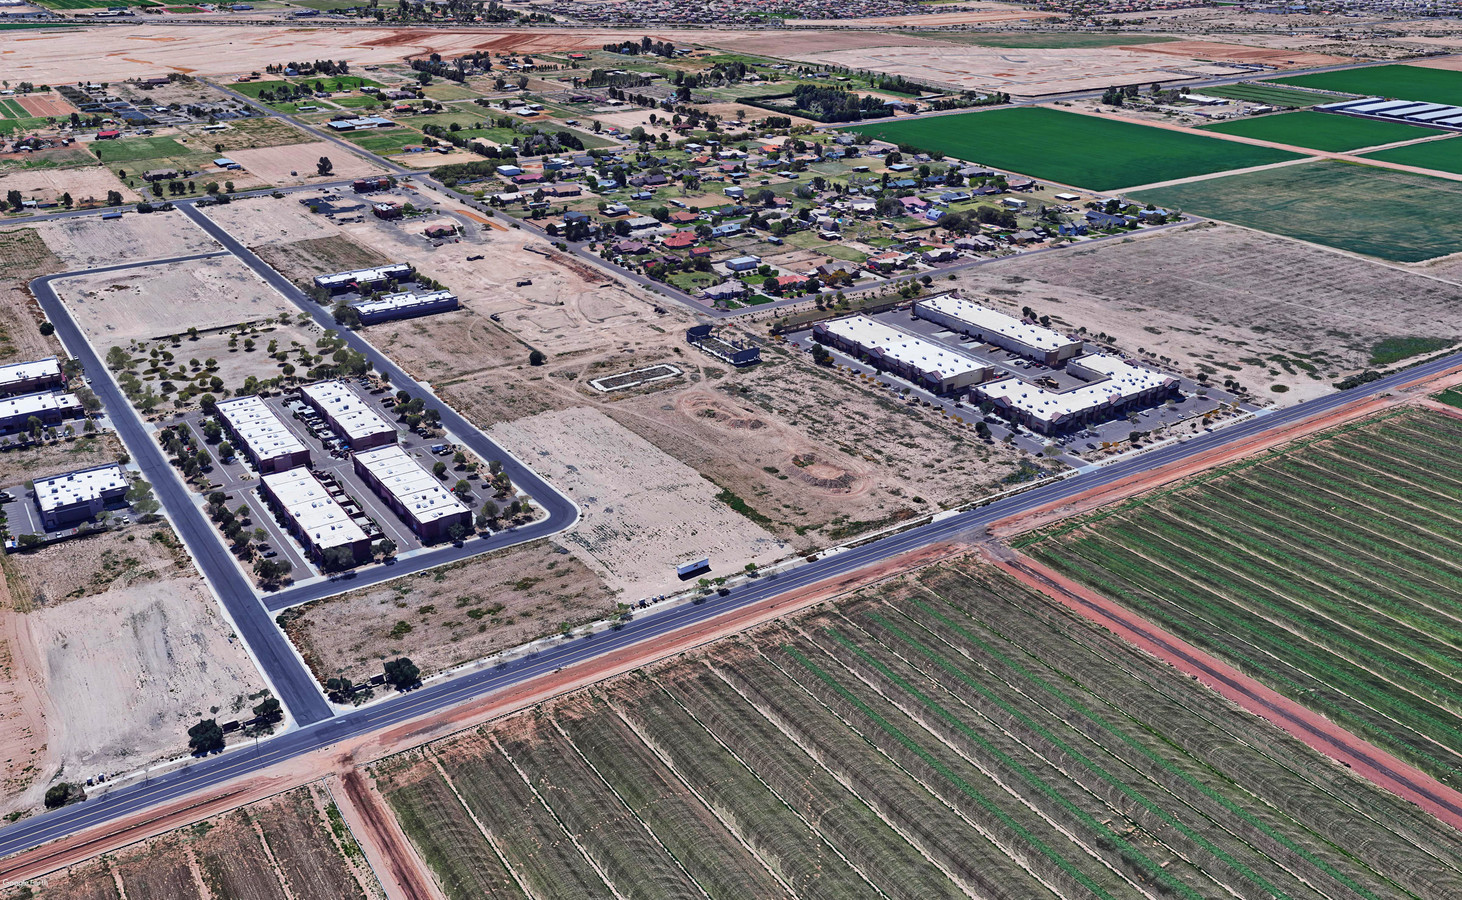 8934 E Waltham Ave, Mesa AZ 85212 Industrial Land